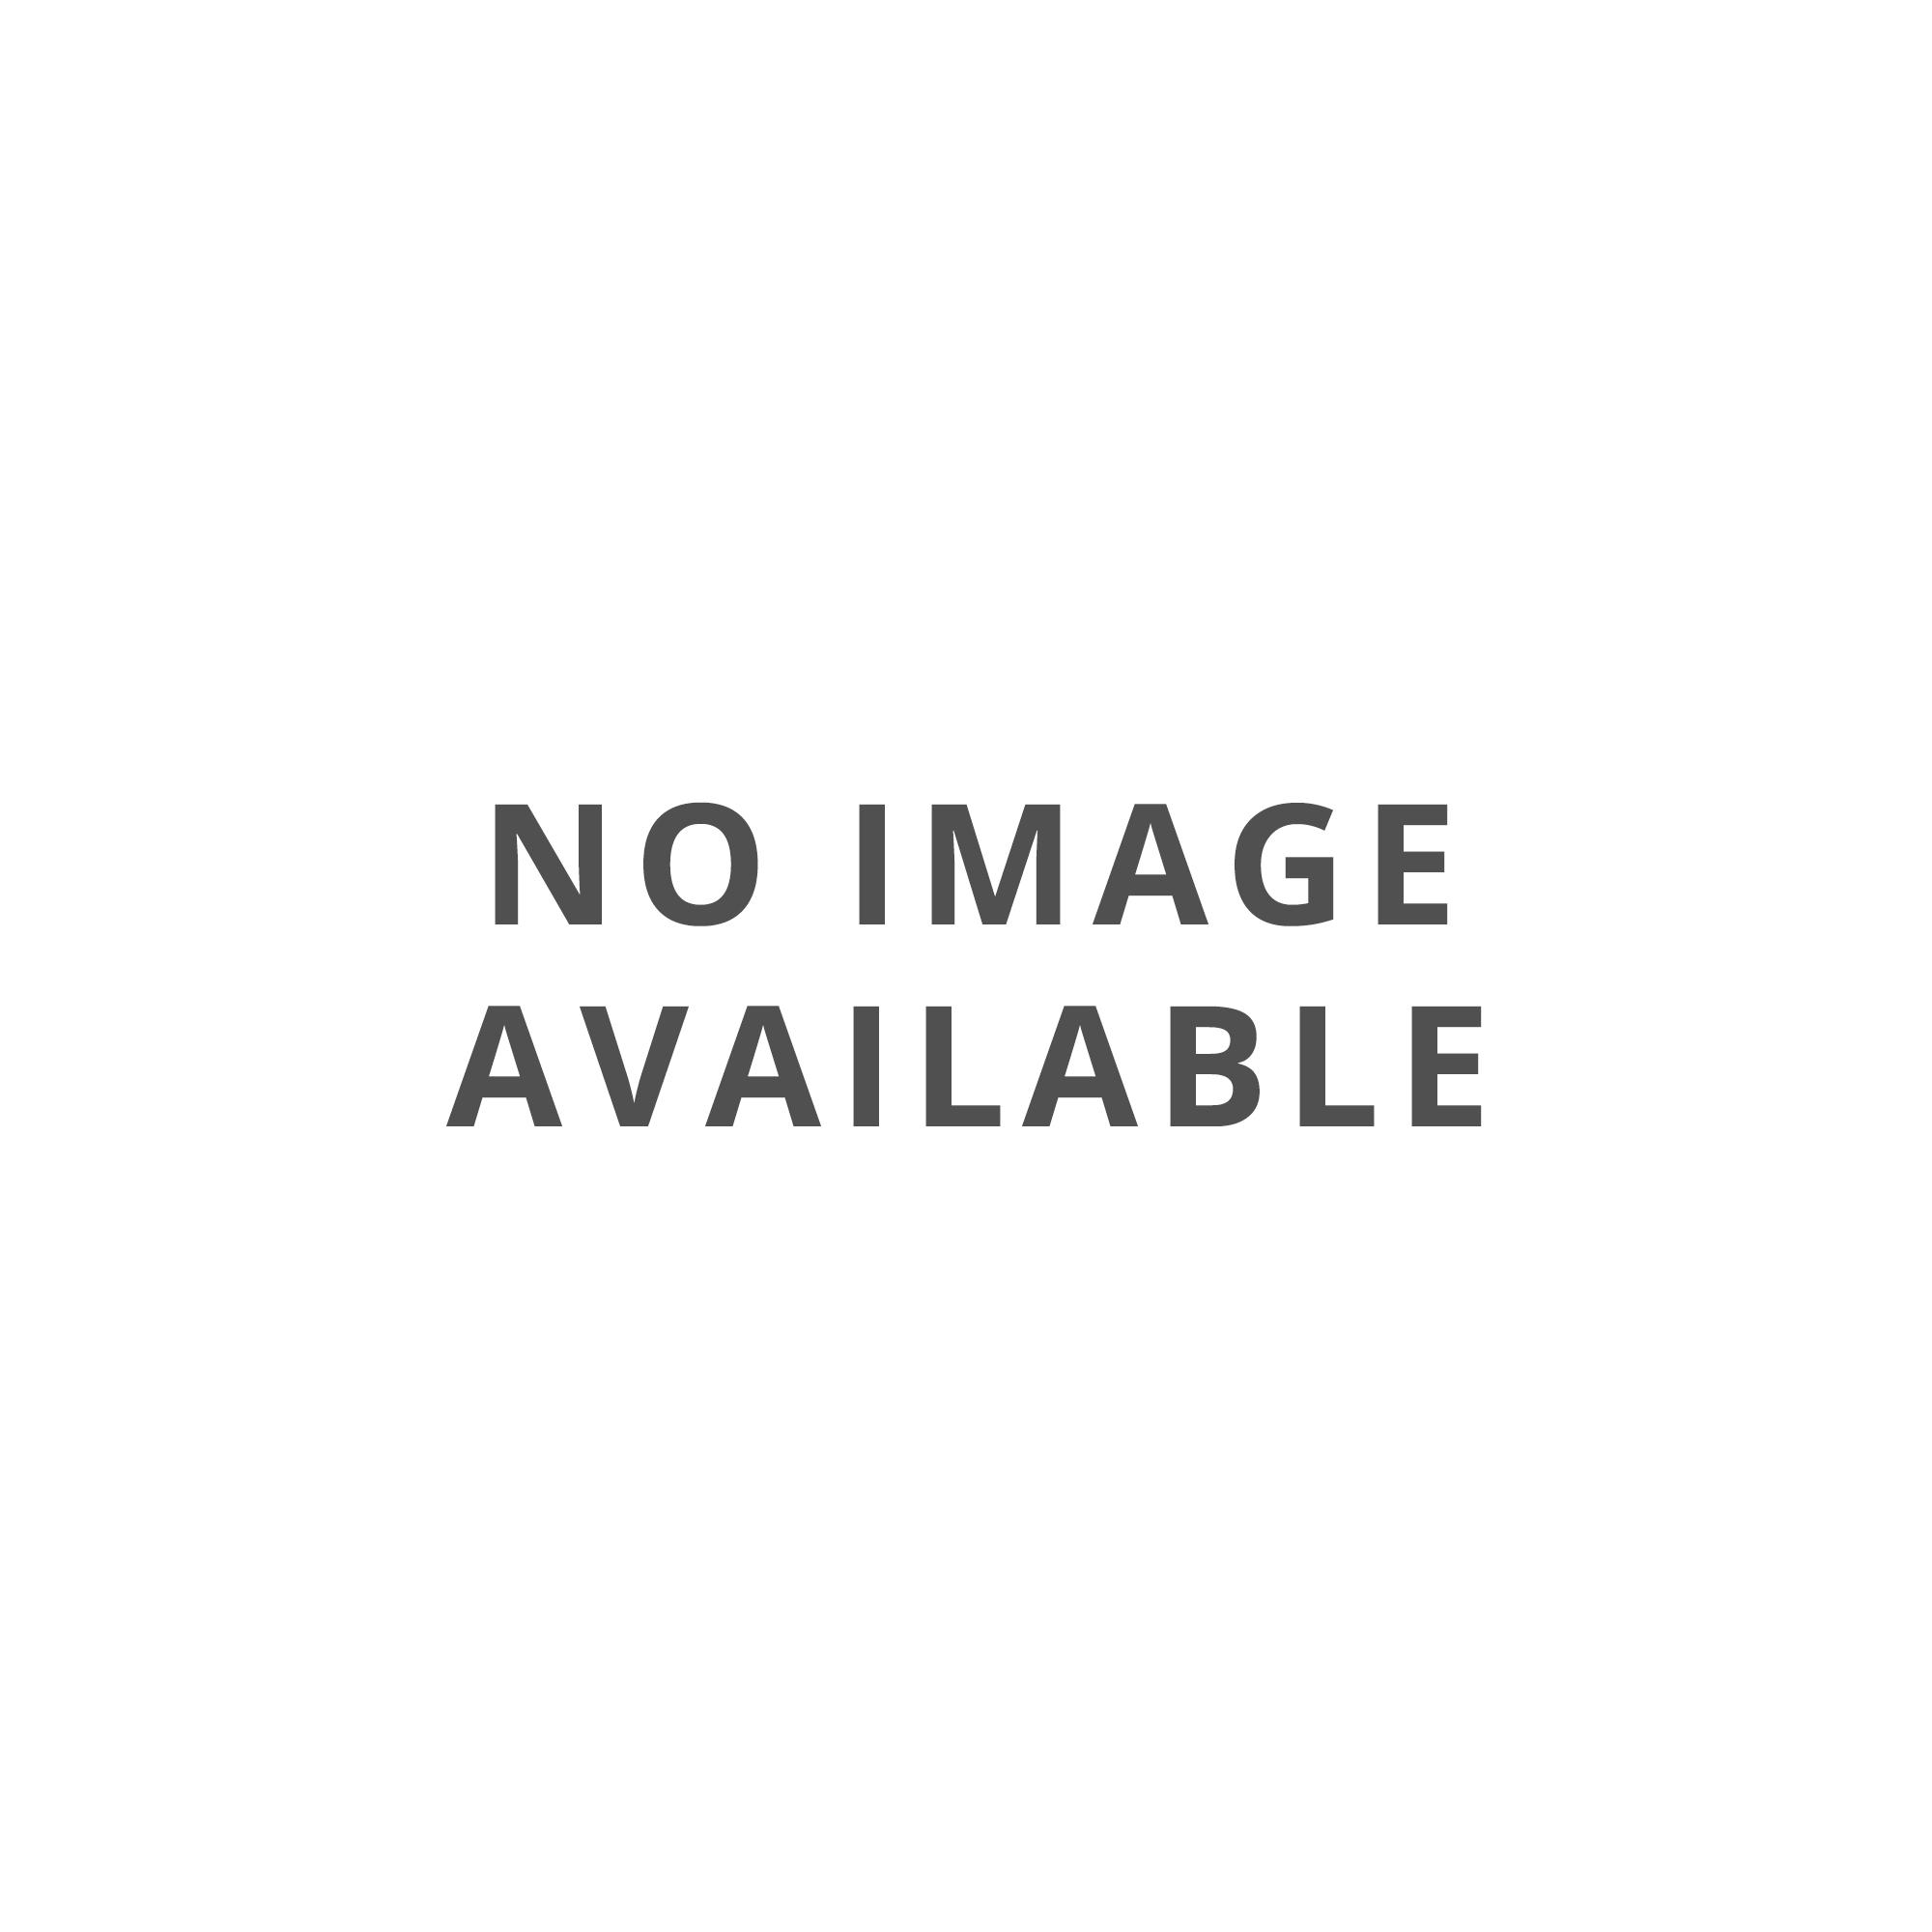 Black Undermount Kitchen Sinks Undermount Kitchen Sinks